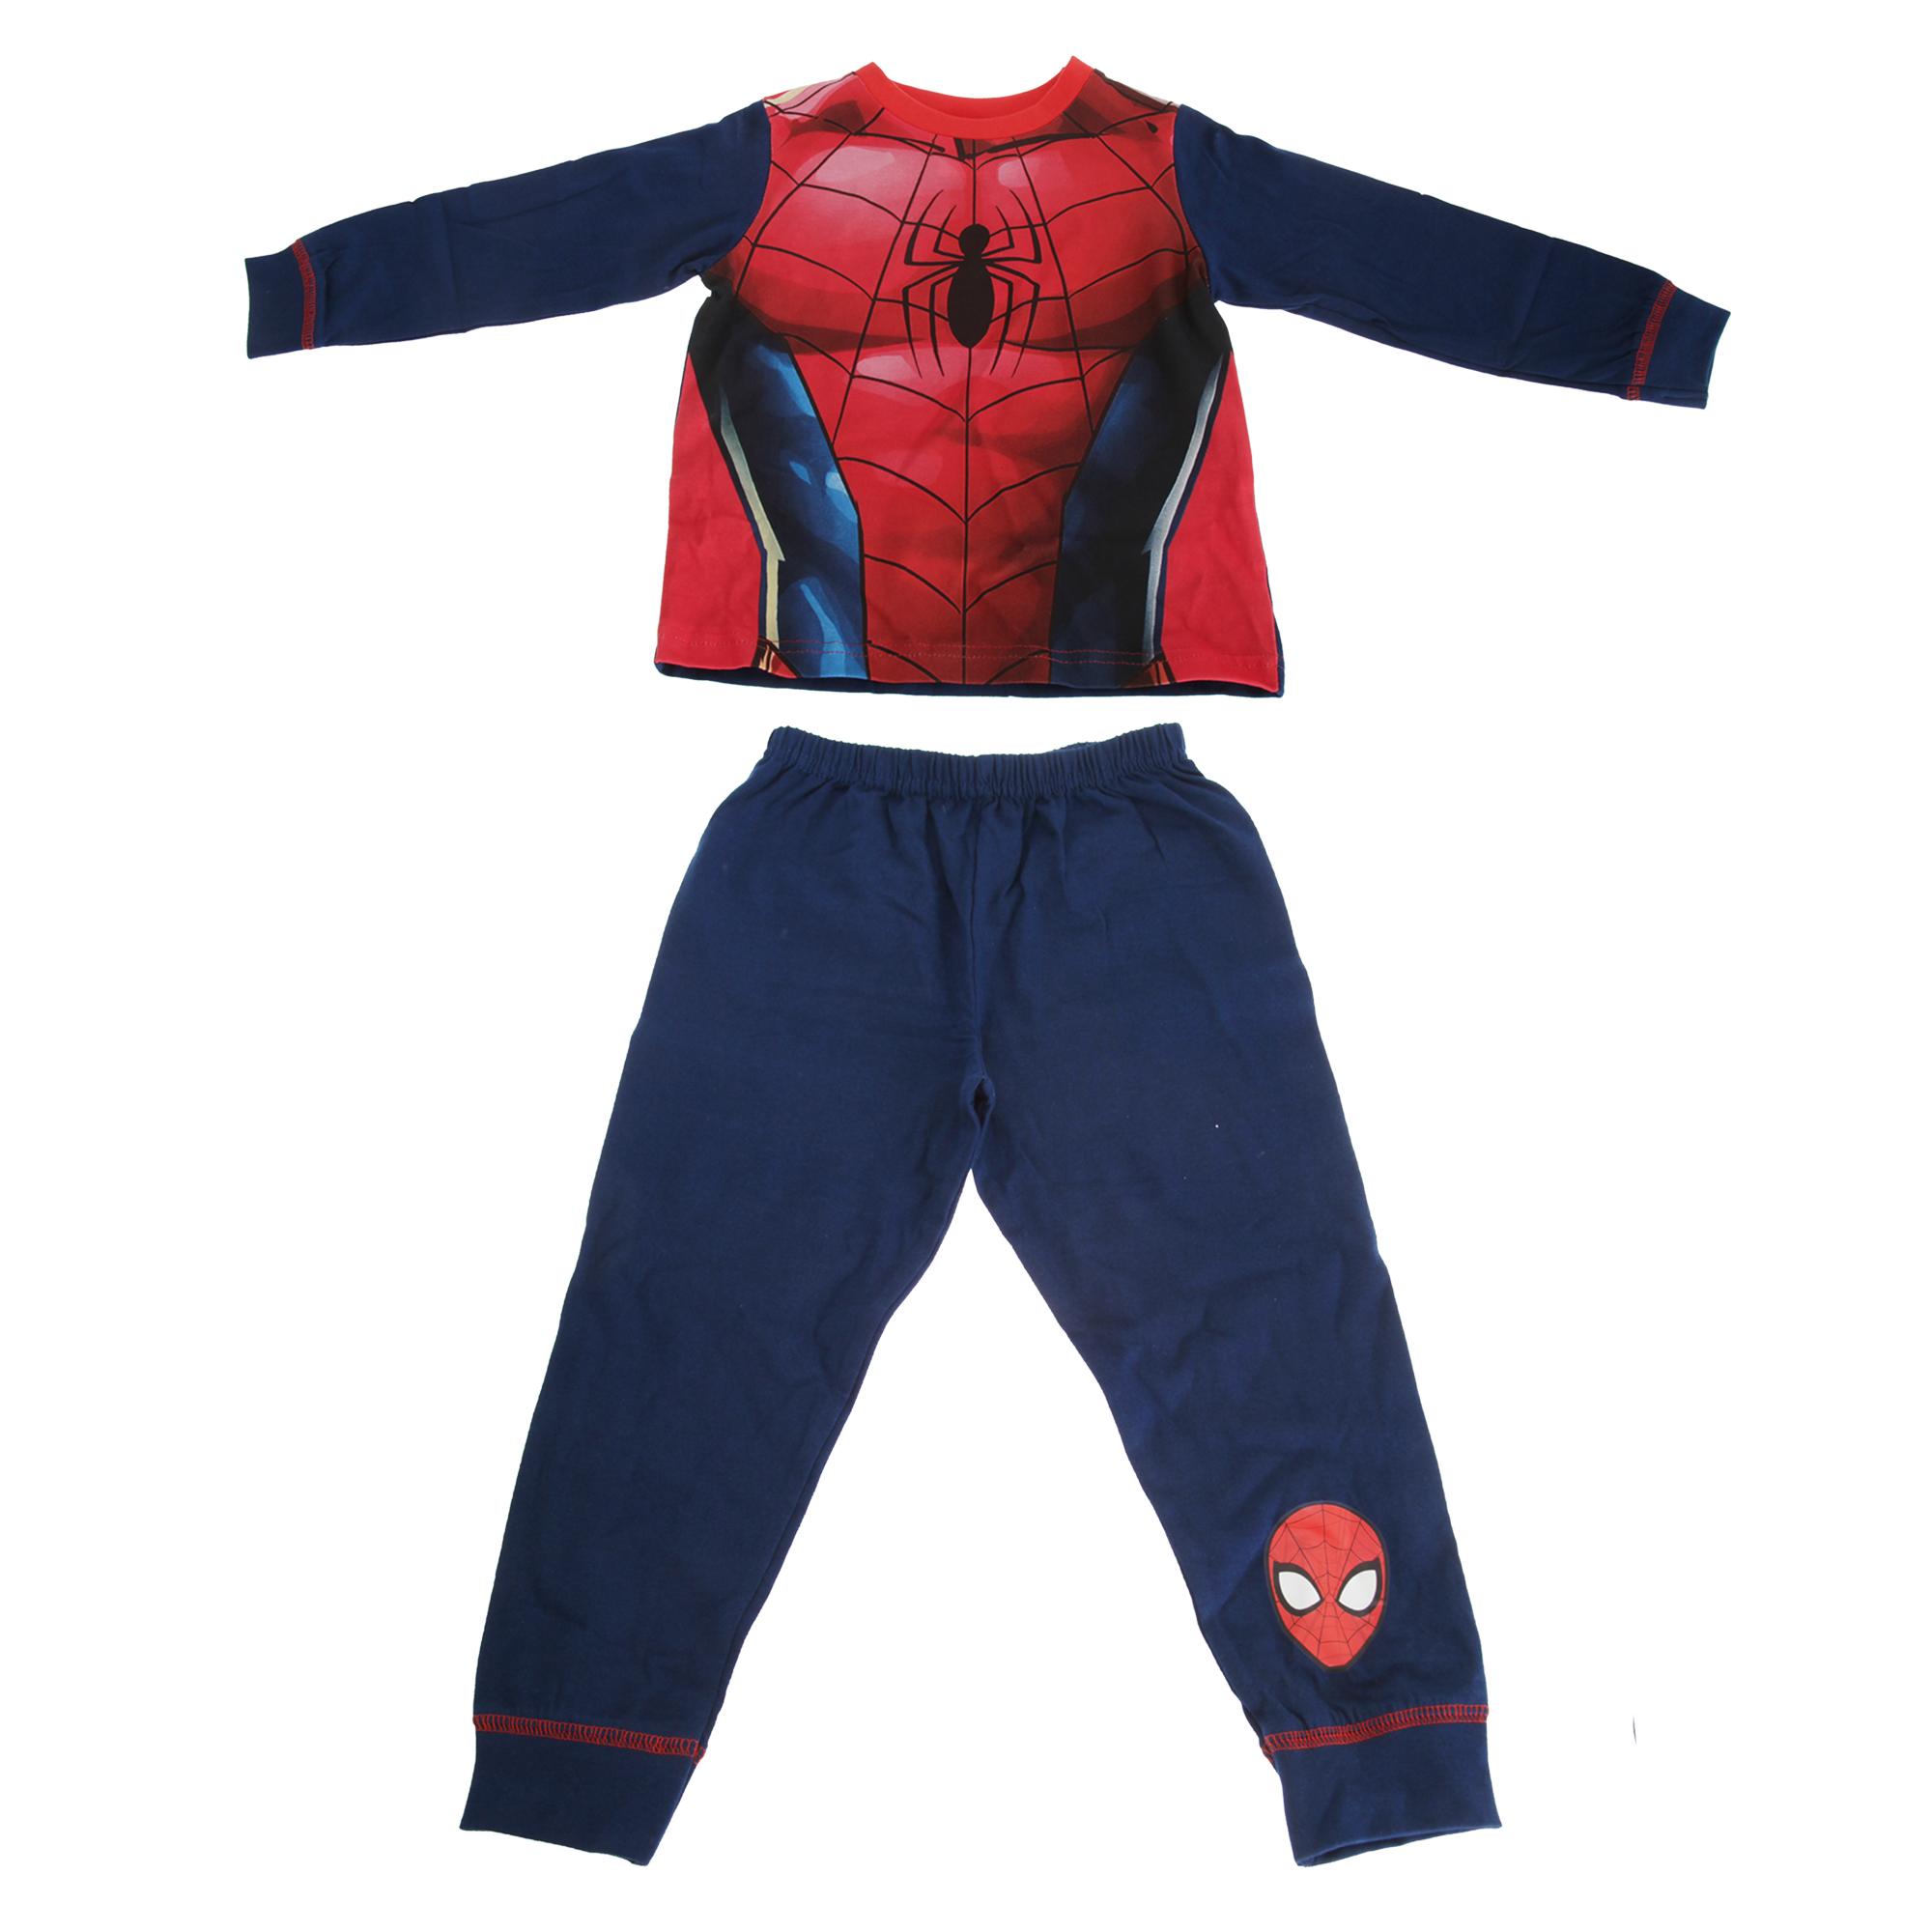 Marvel-Pijama-de-Spiderman-para-nino-N1143